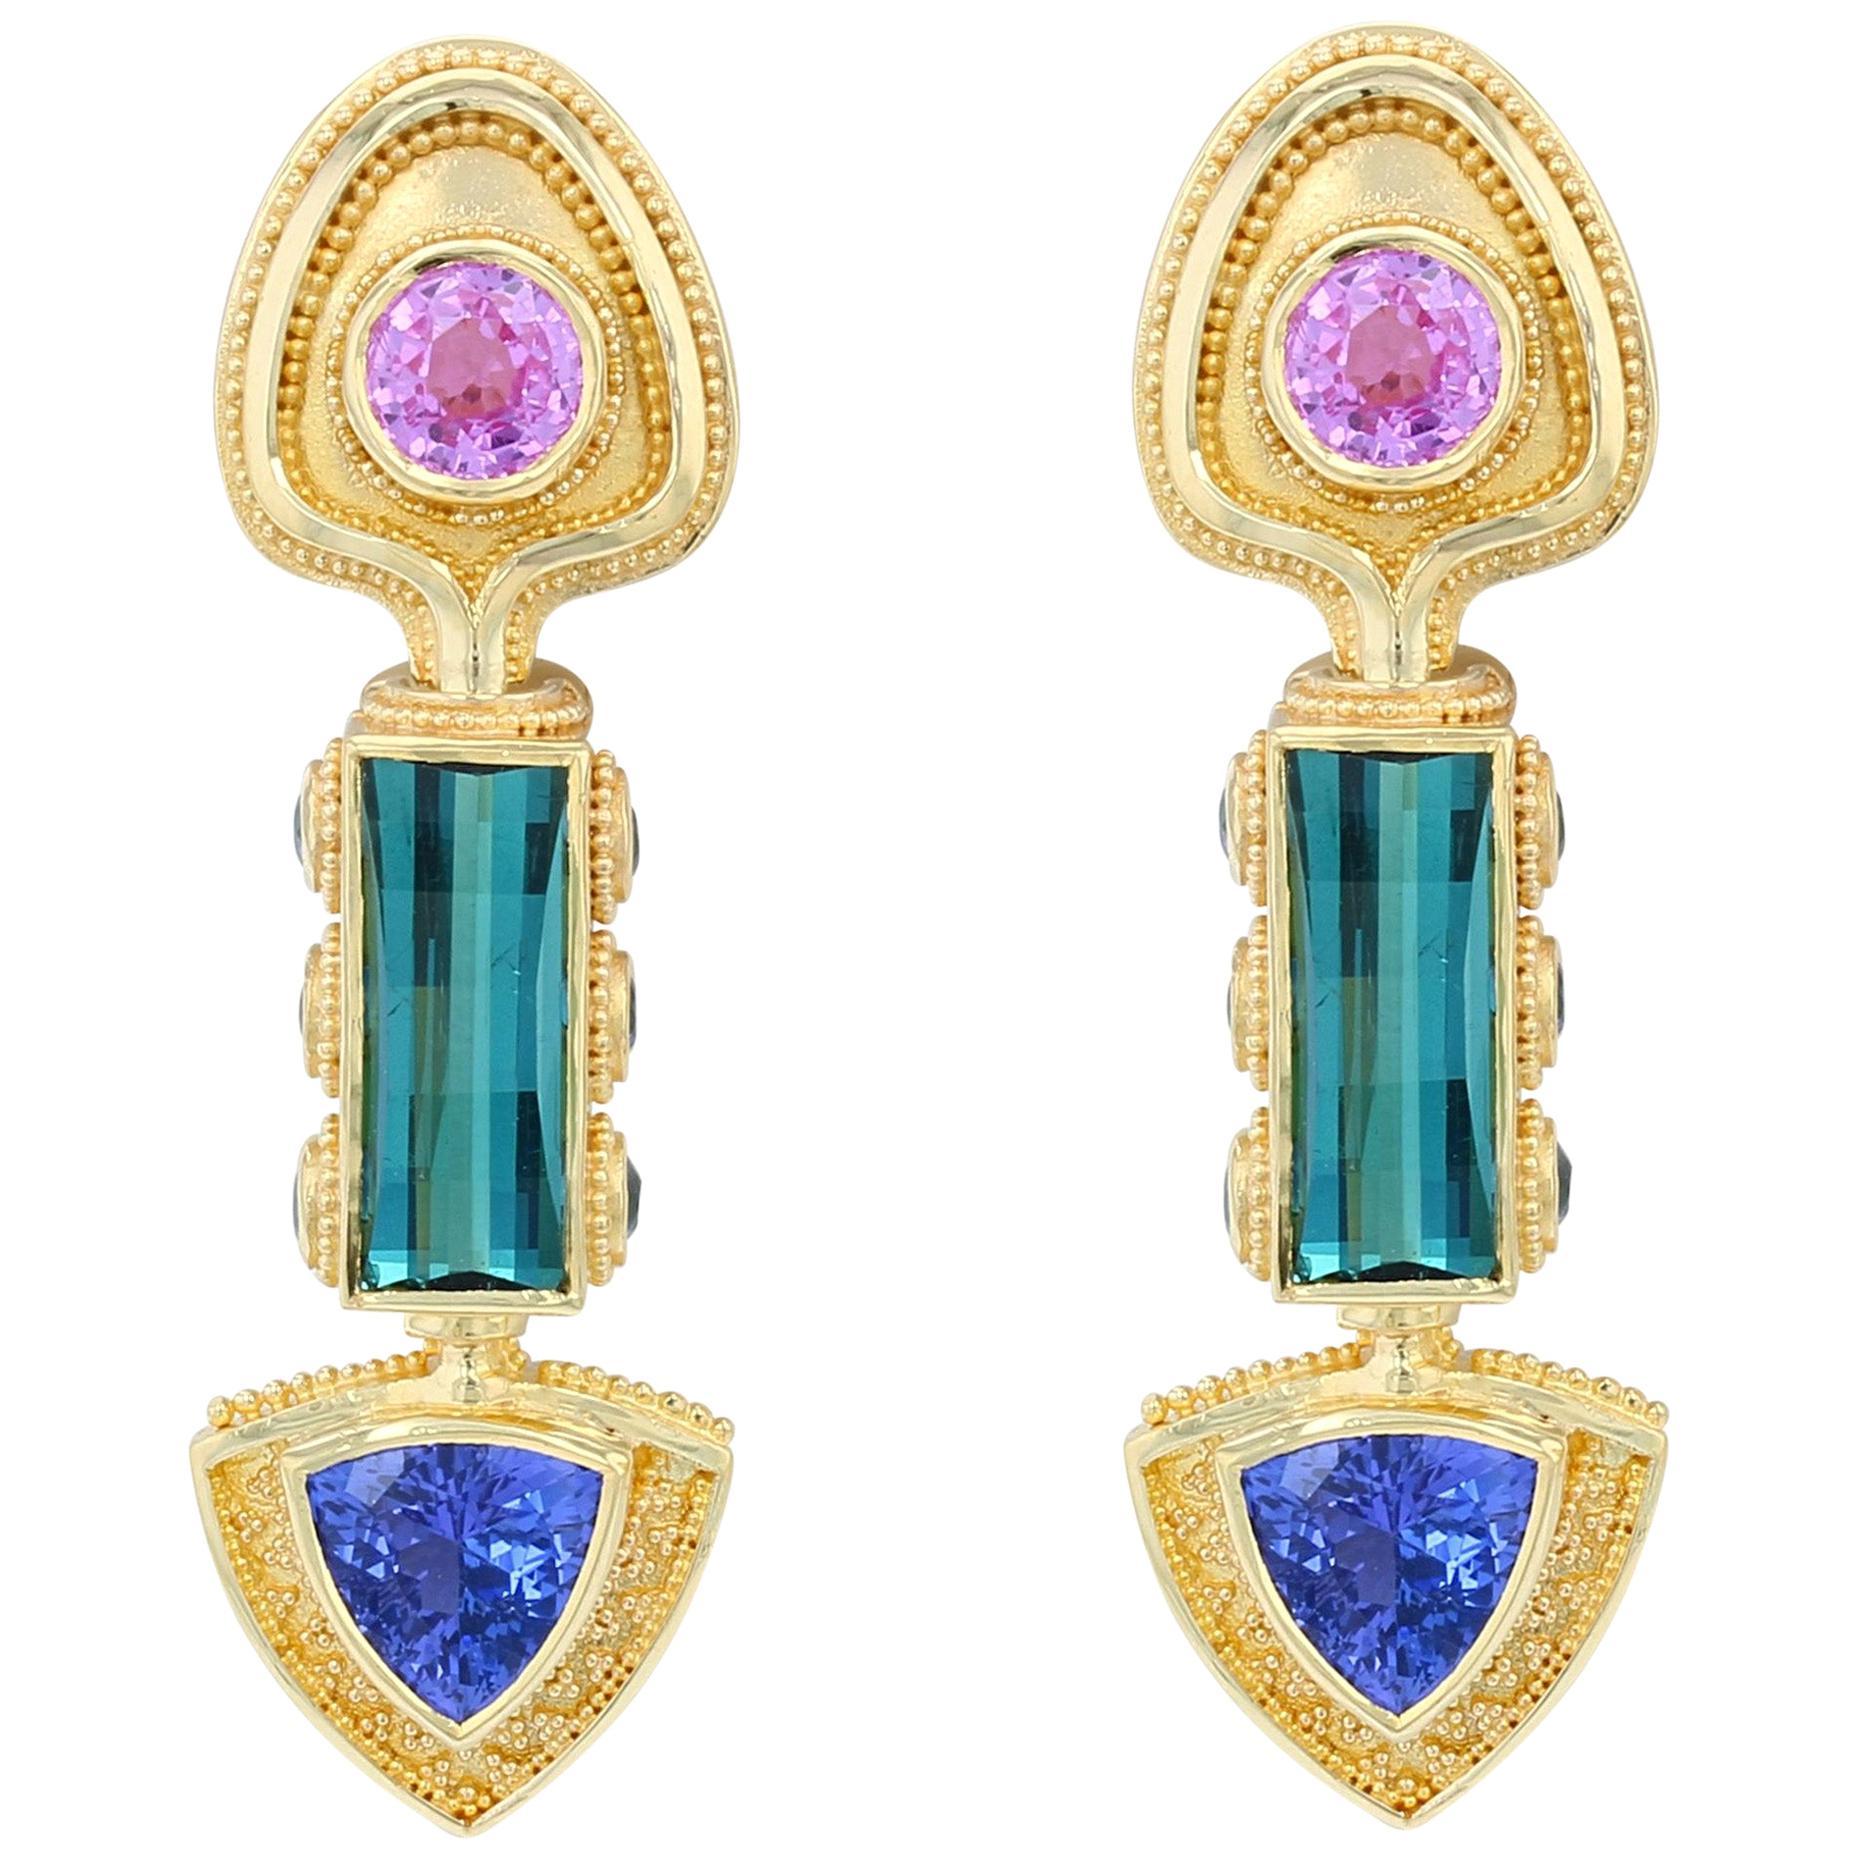 Kent Raible 18 Karat Gold Multi Gemstone Drop Earrings with Fine Granulation